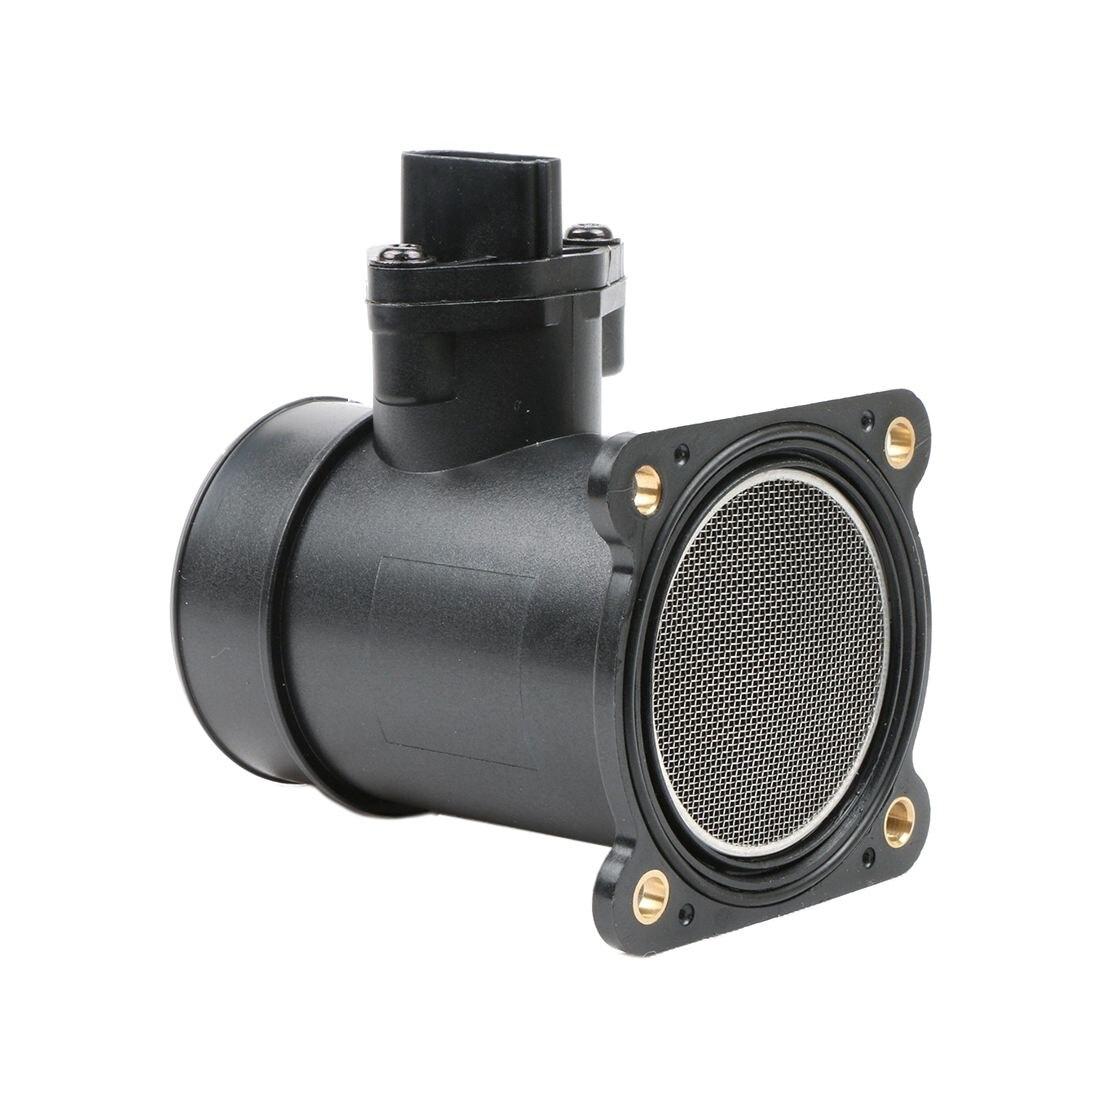 New Mass Air Flow Sensor Meter MAF For 00-02 Sentra 1.8L Replaces 22680-5M000 volvo s60 v70 2 4 air mass sensor maf new oem genuine charge flow meter sender